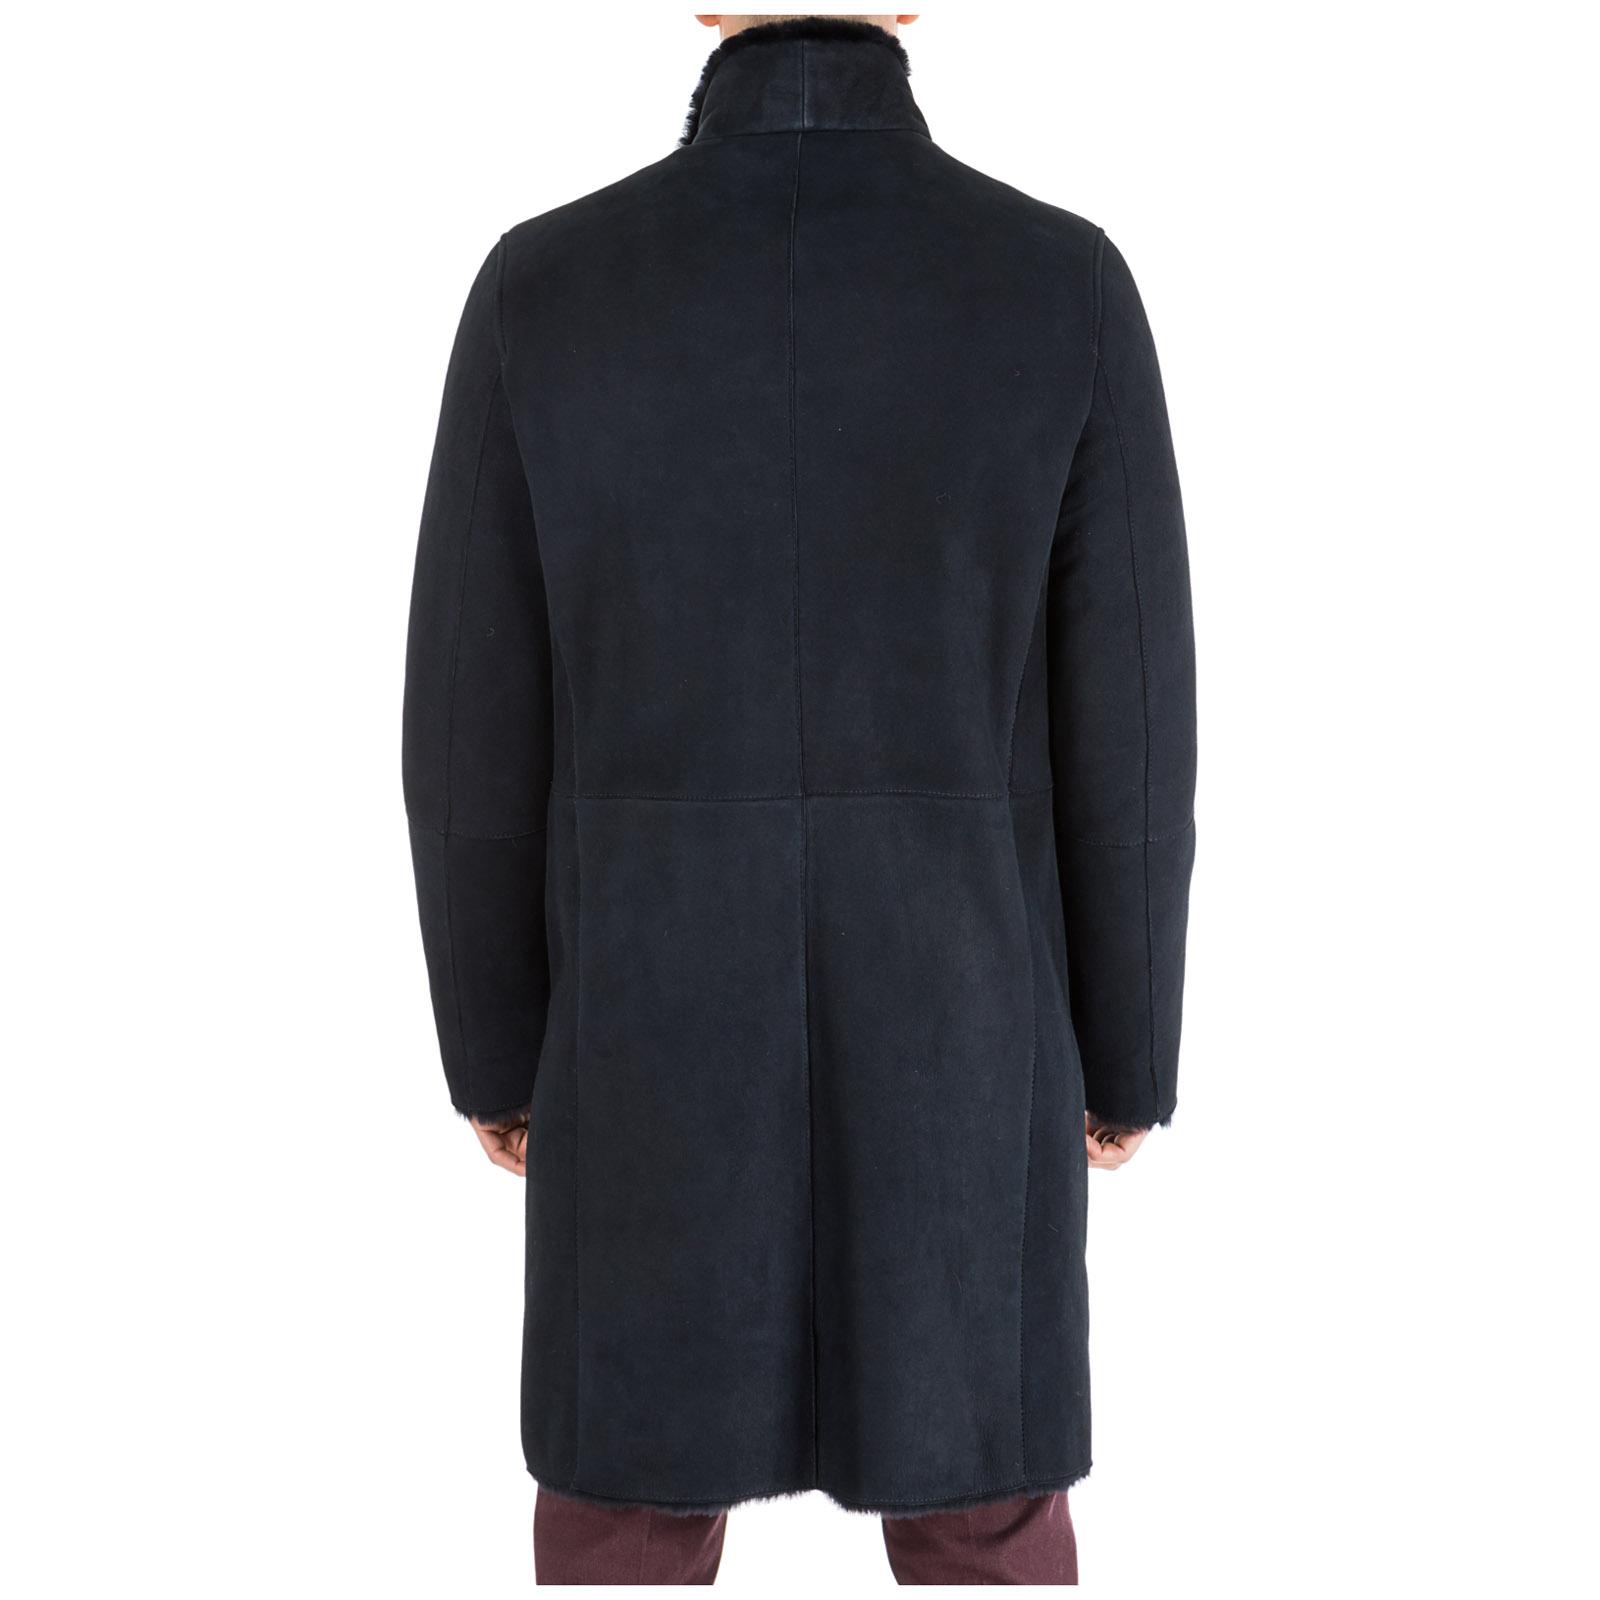 finest selection 654e3 e1b5a Cappotto uomo